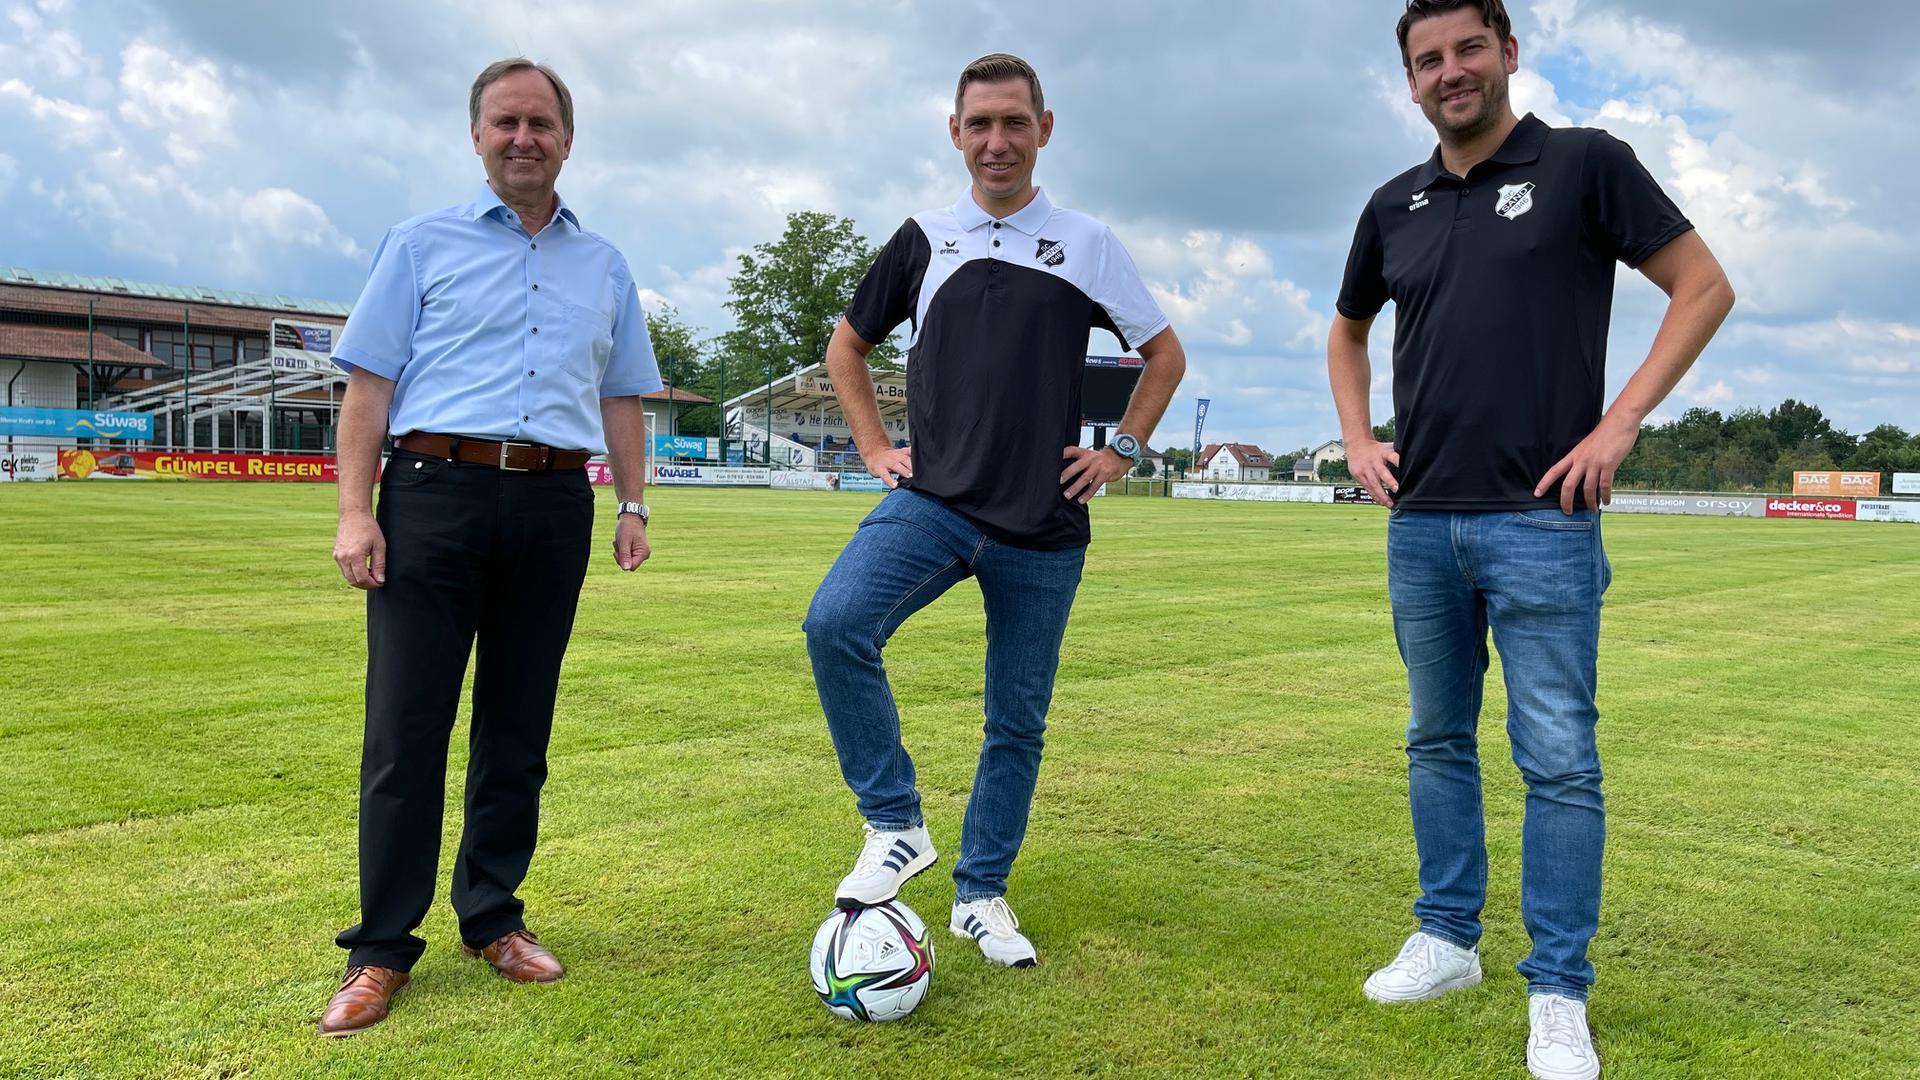 Gerald Jungmann (Manager), Matthias Frieböse, Sascha Reiß (Sportlicher Leiter)